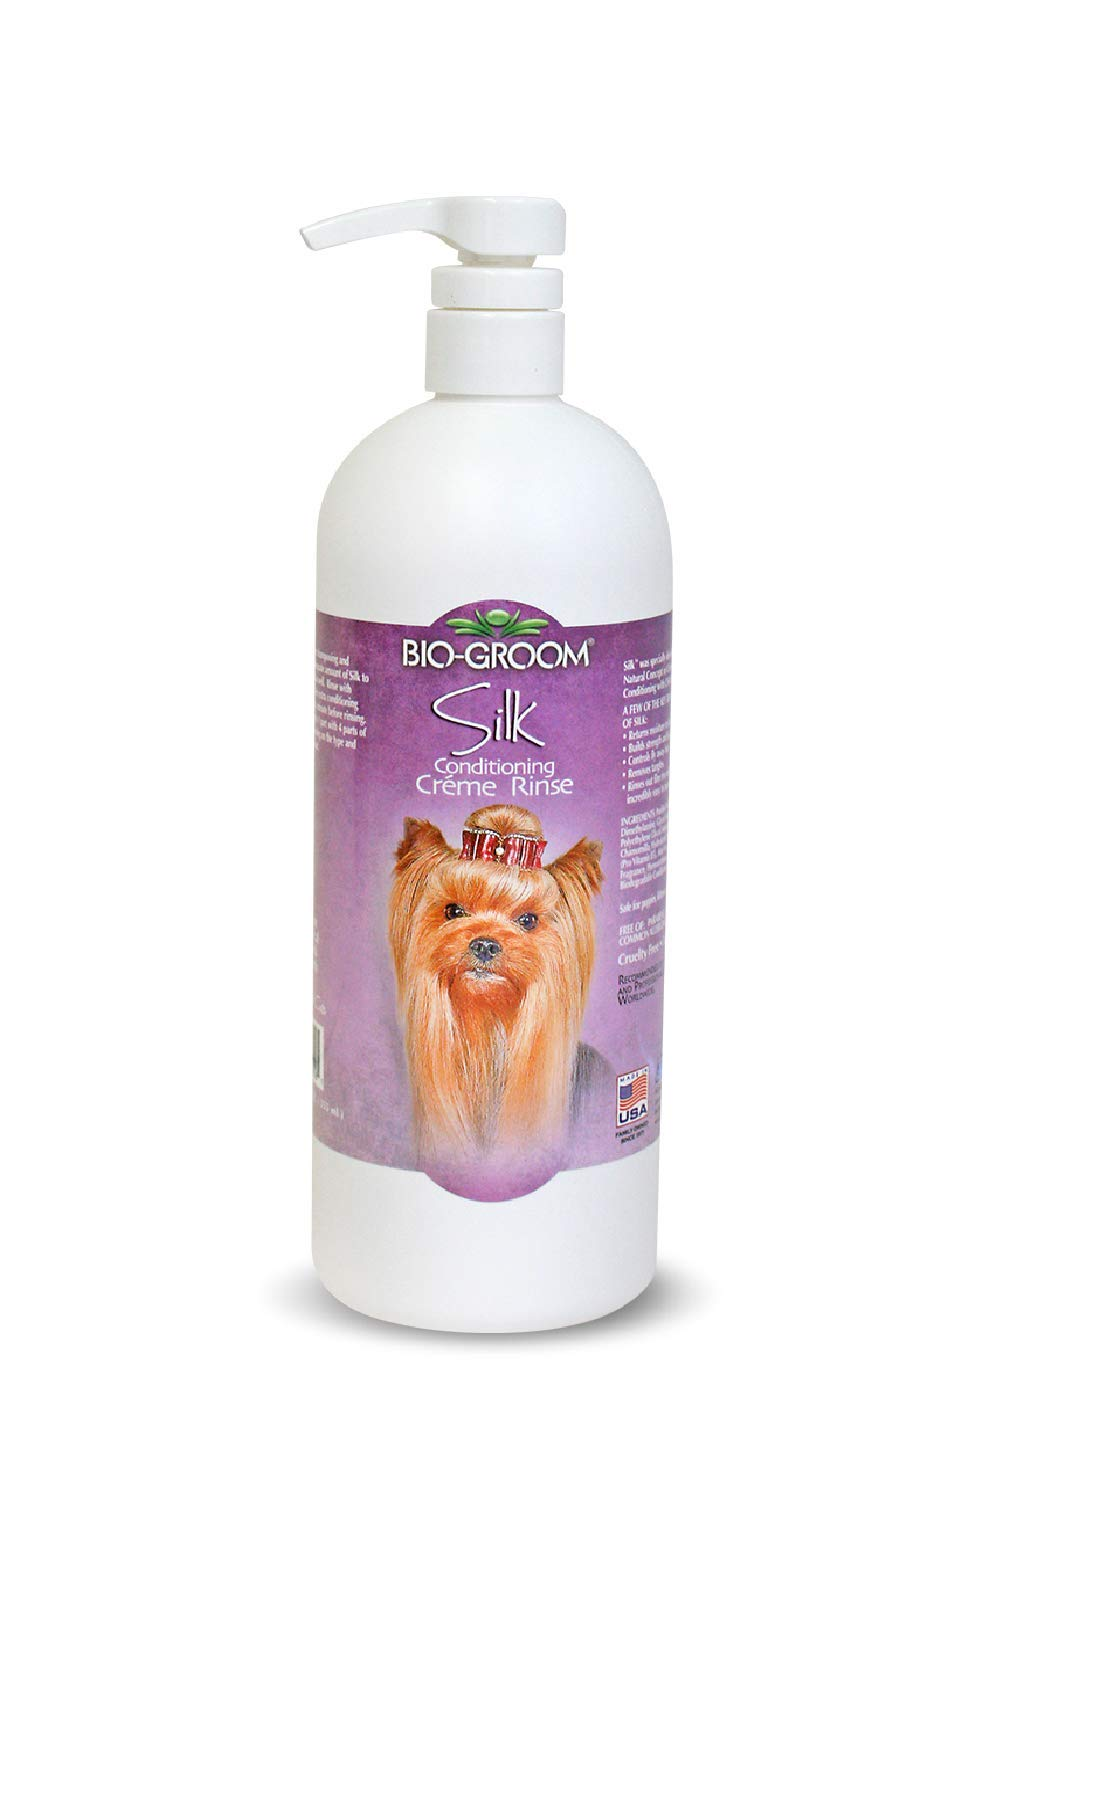 Bio-groom 32032 32 oz Silk Conditioning Creme Rinse